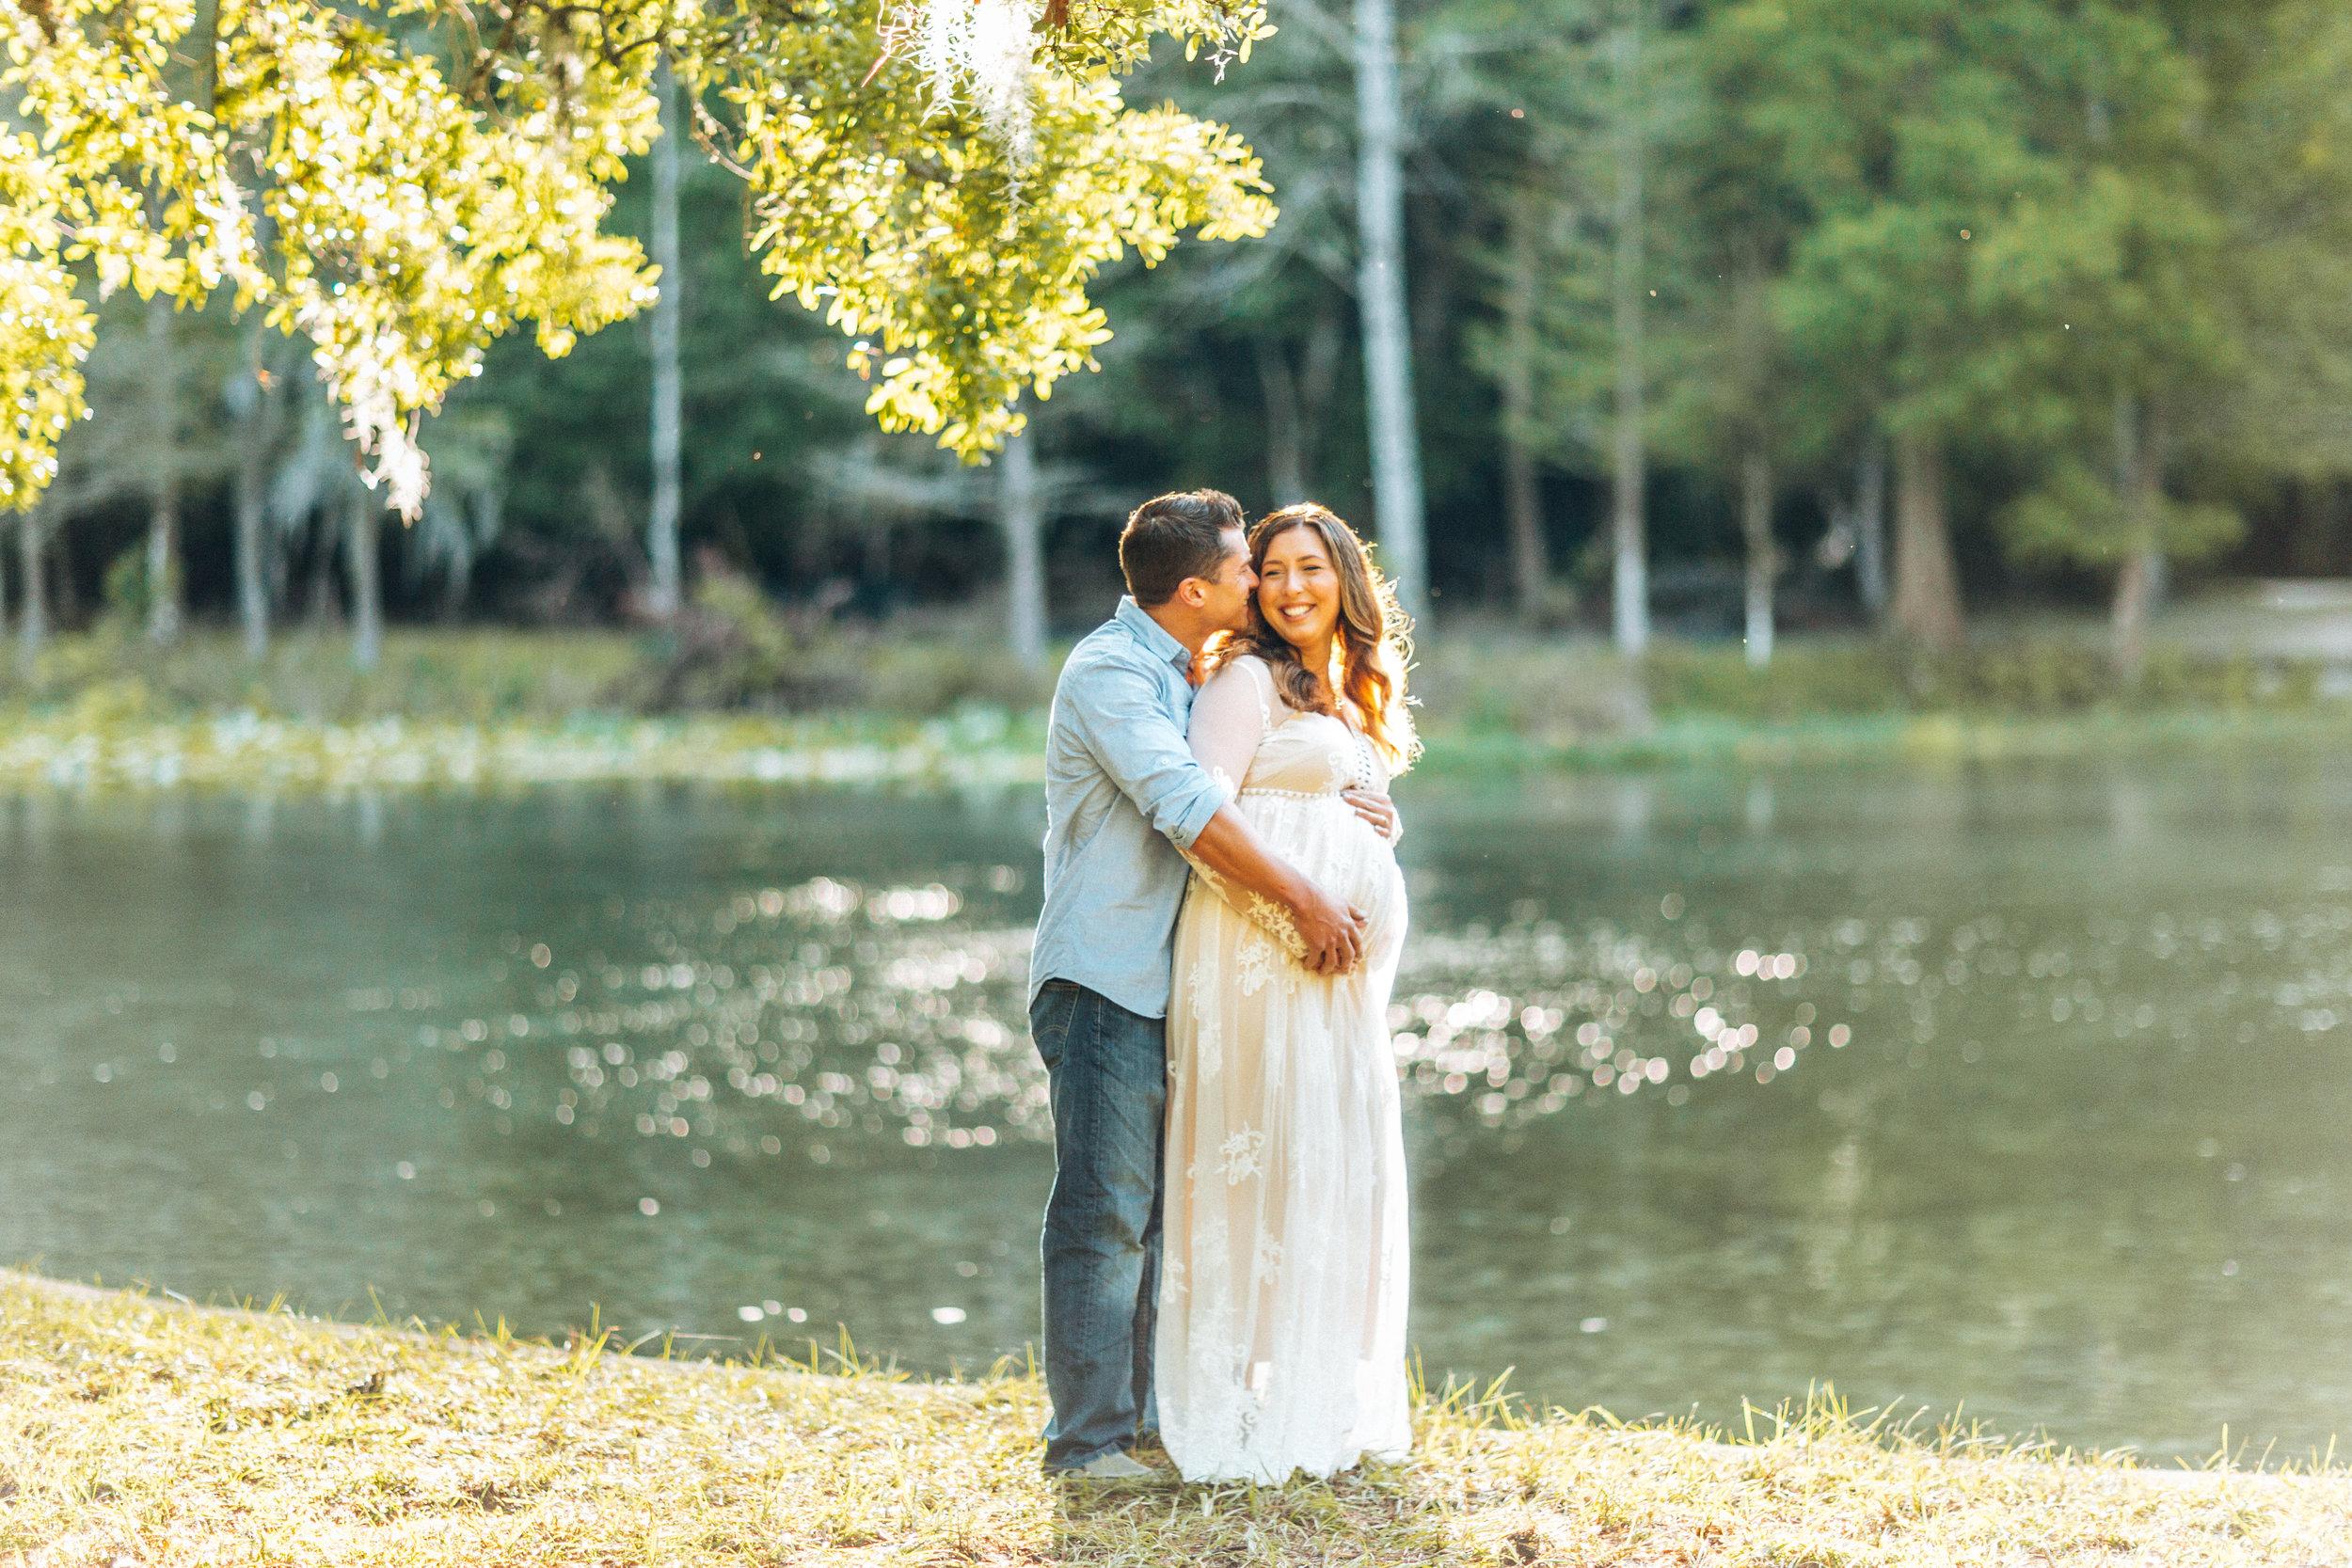 Sneak Peak-Florida Springs maternity photo session- Stephanie+Ryan- ShainaDeCiryan.com-3.jpg